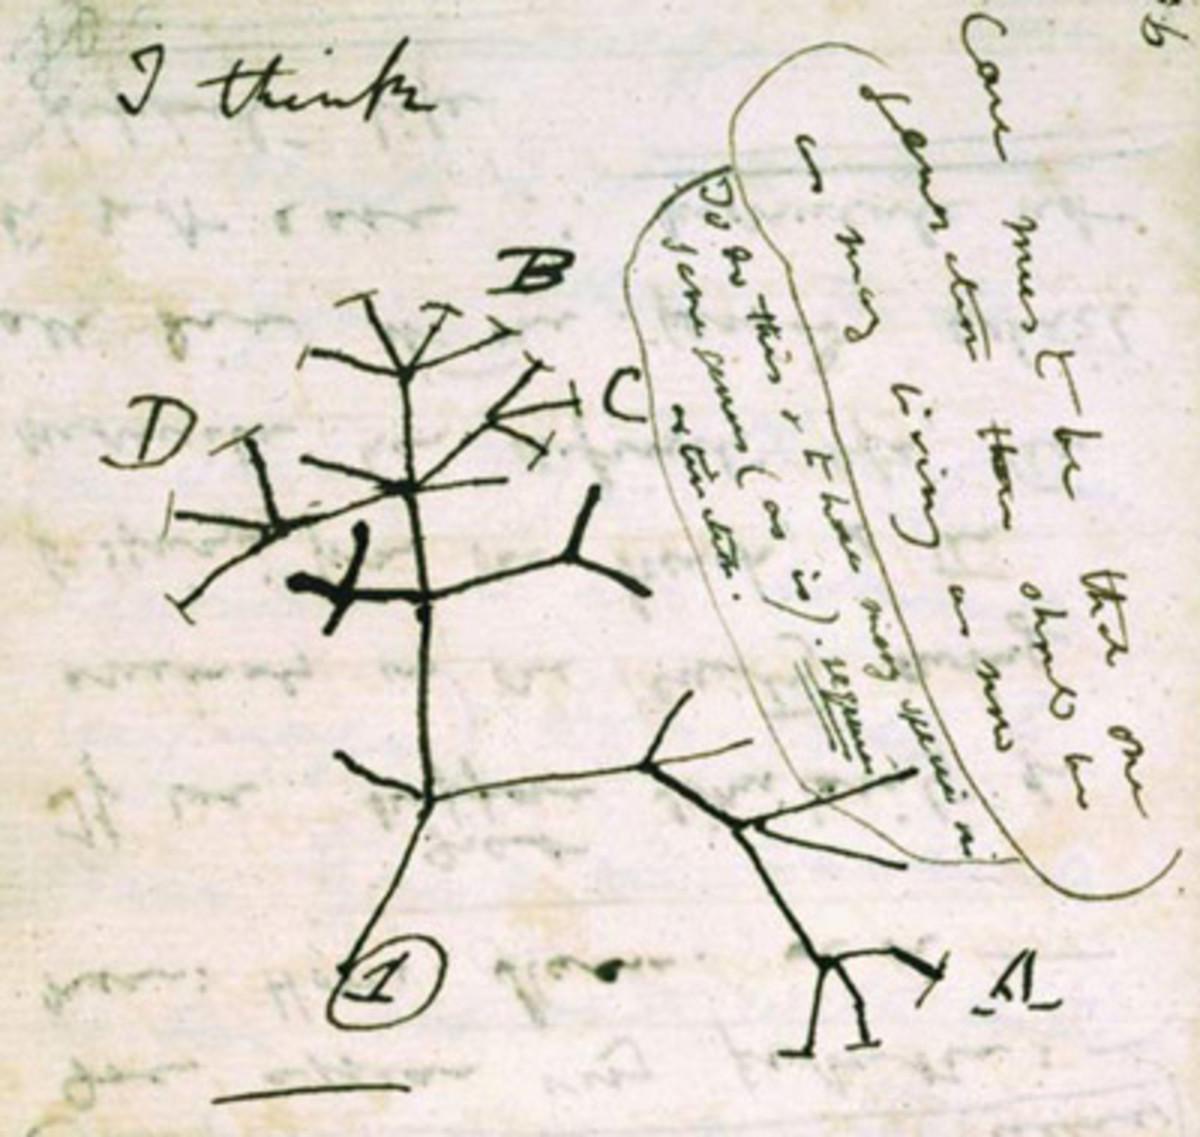 Darwin's Original Sketch of the Tree of Life